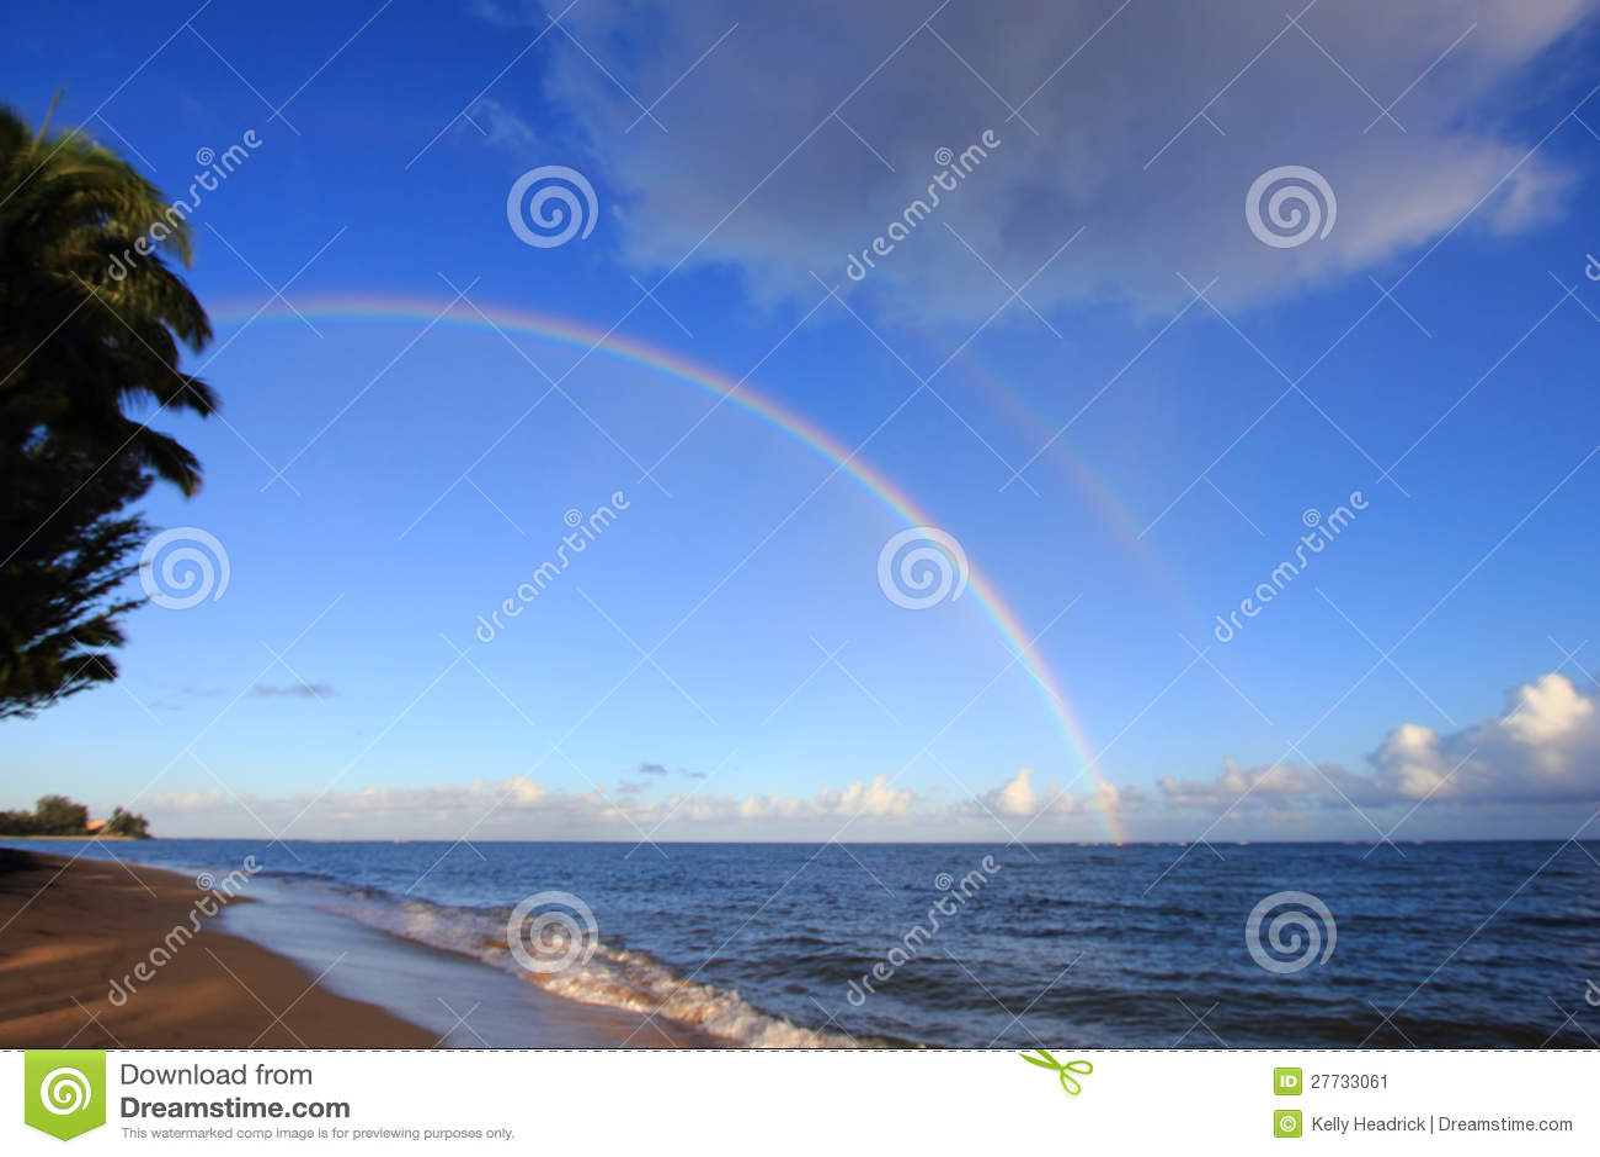 Regenbogen über dem Ozean